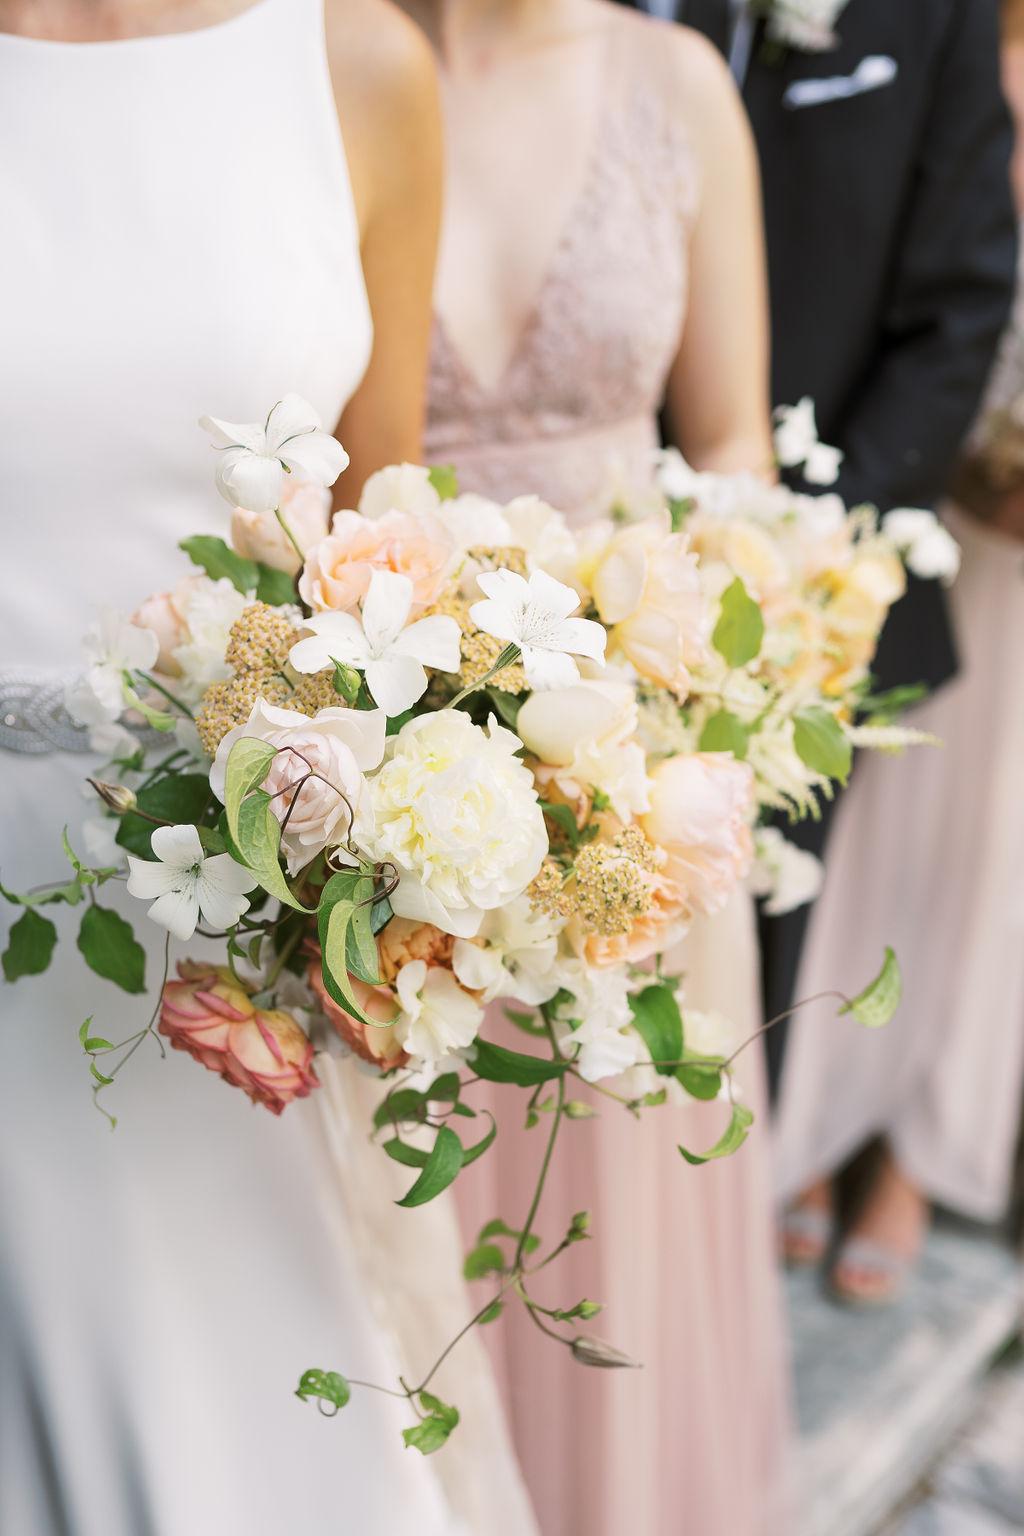 Alexandra-Elise-Photography-Film-Wedding-Photographer-Sonnenberg-Gardens-Finger-Lakes-Canandaigua-Wedding-Party-102.jpg